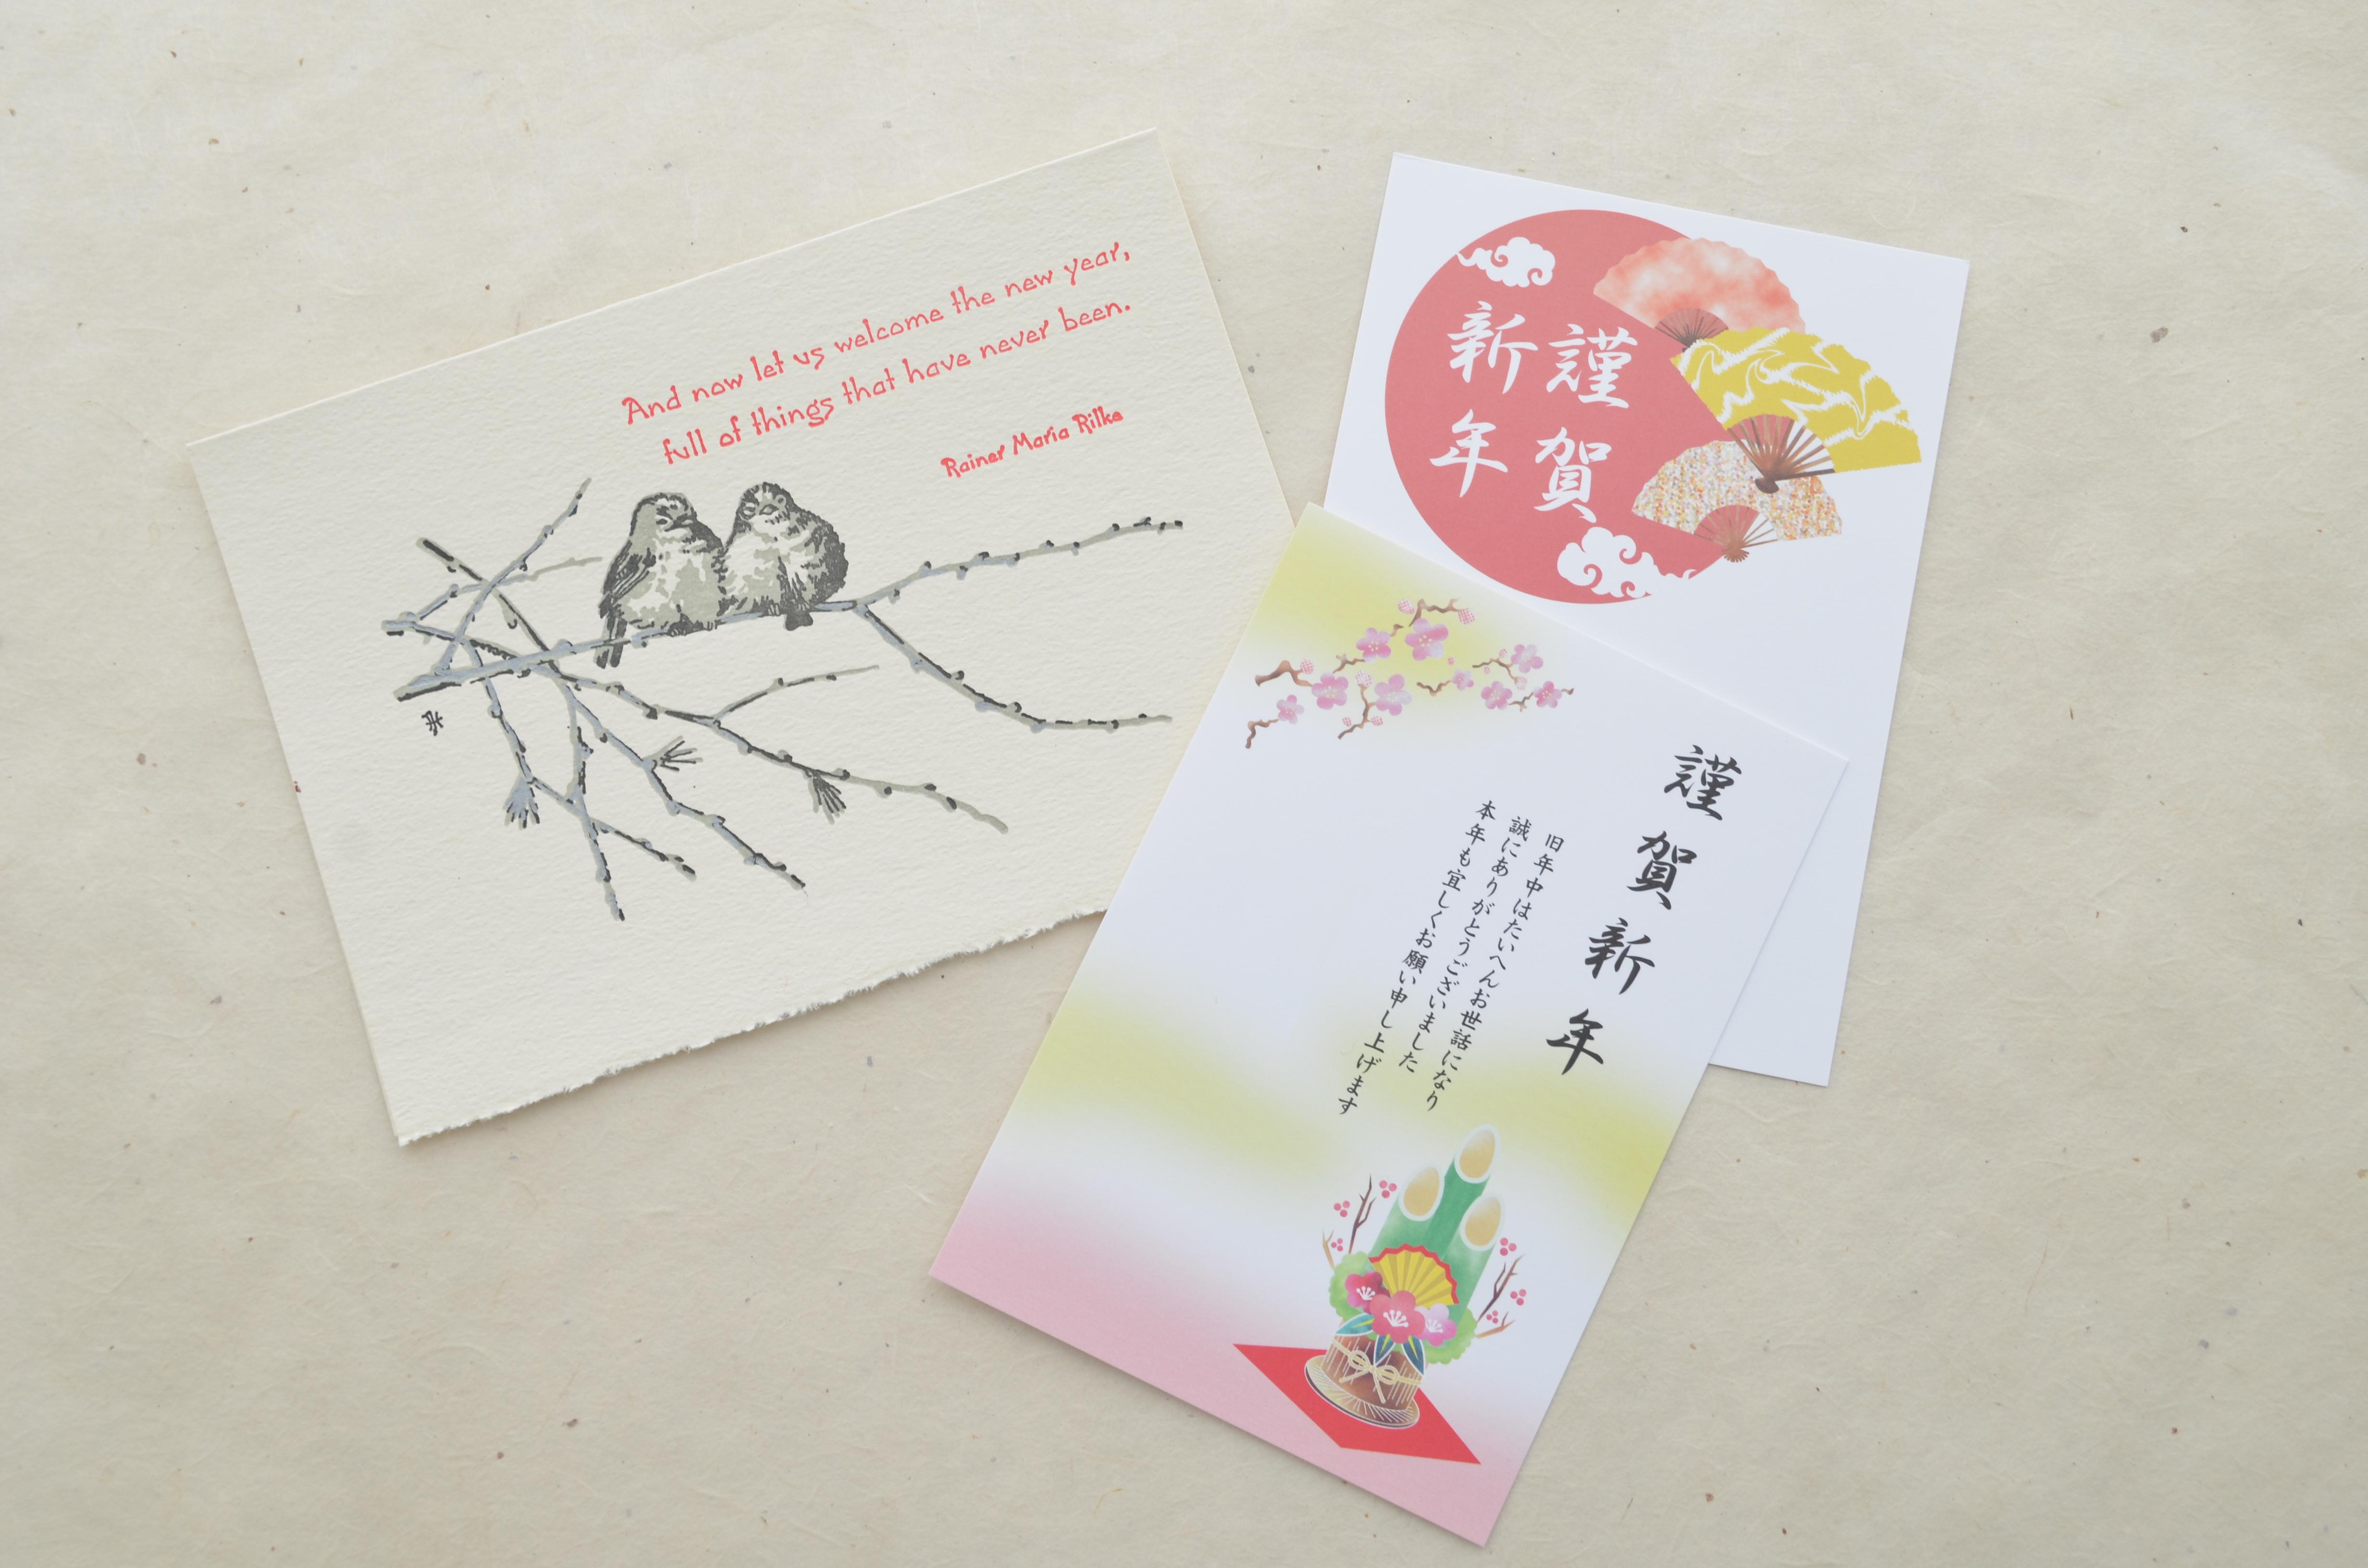 Smart New Years Nengajo New Cards 2015 Kimberly Ah New Year Cards 2018 New Years Cards Ideas cards New Years Cards